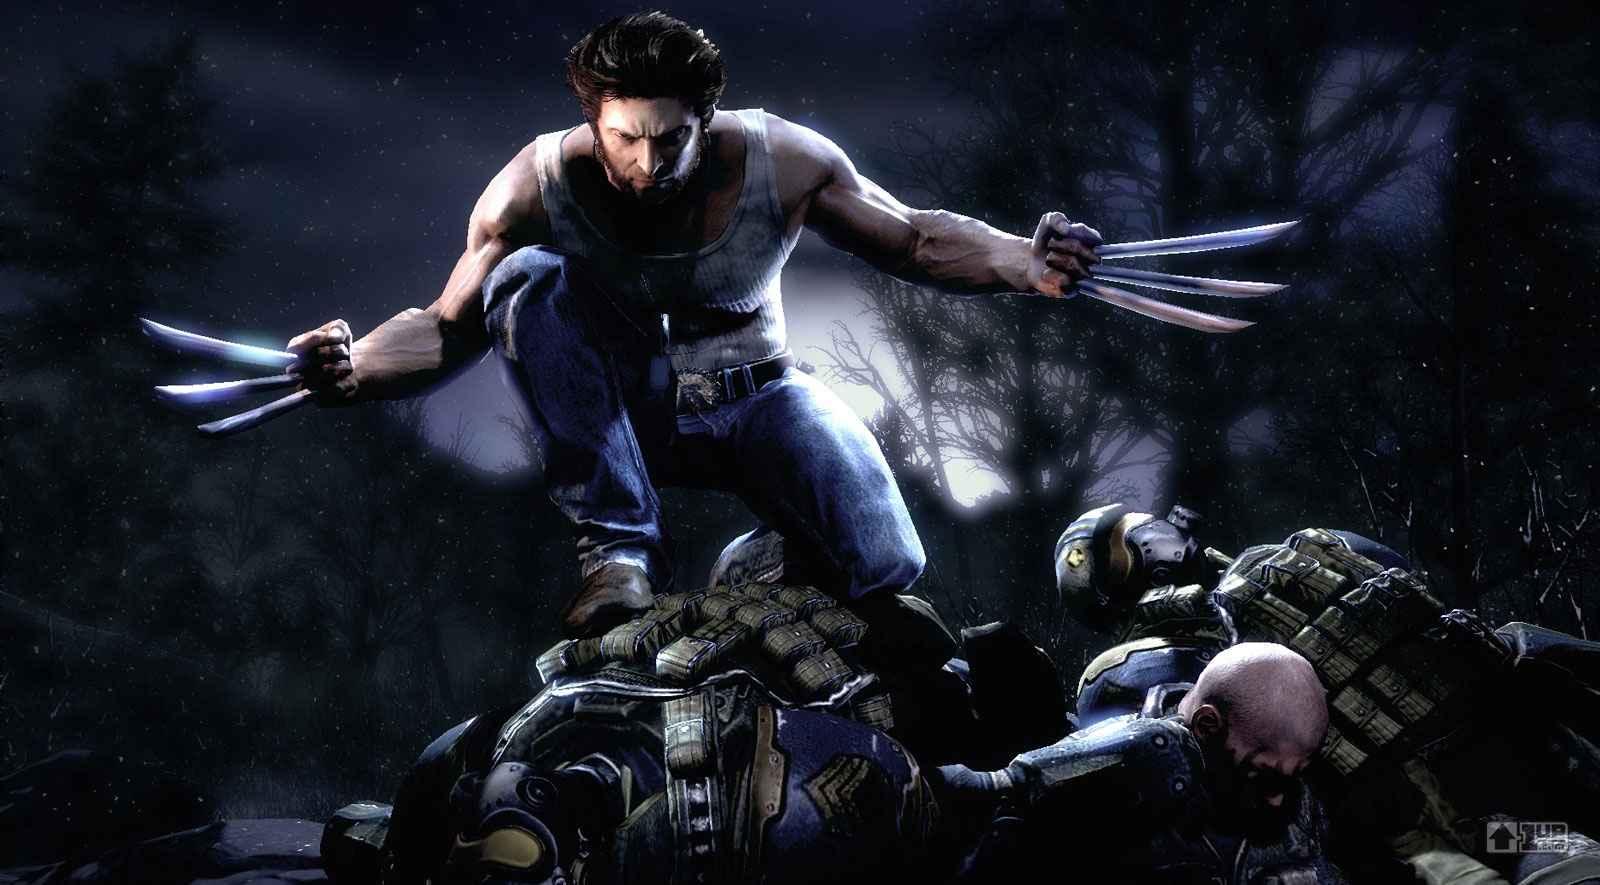 Hd wallpaper x man - X Men Origins Wolverine Game Wallpaper